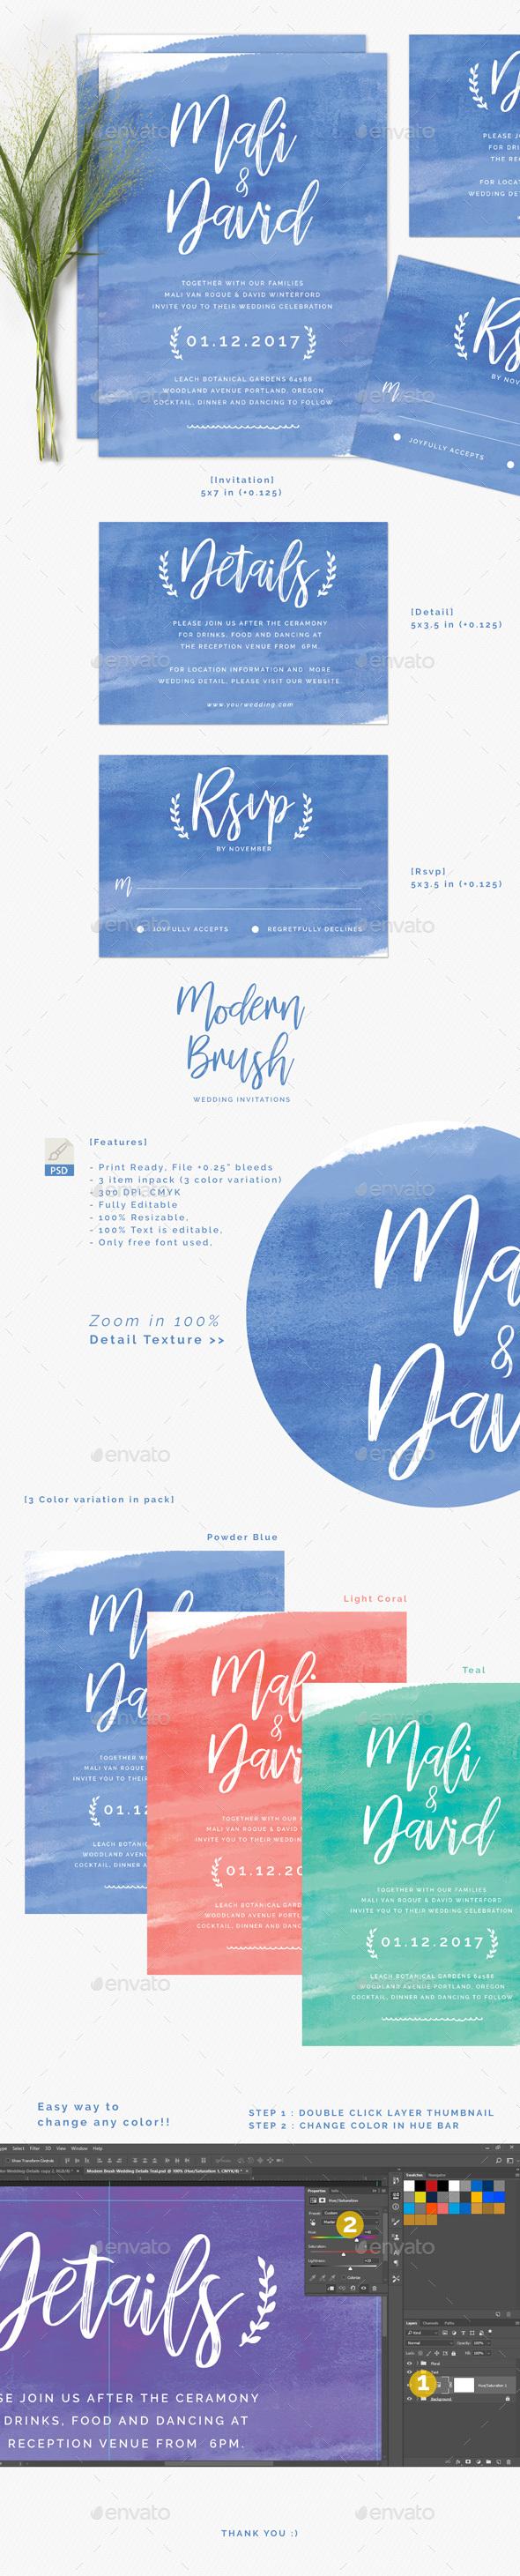 Modern Brush Wedding Invitations - Wedding Greeting Cards